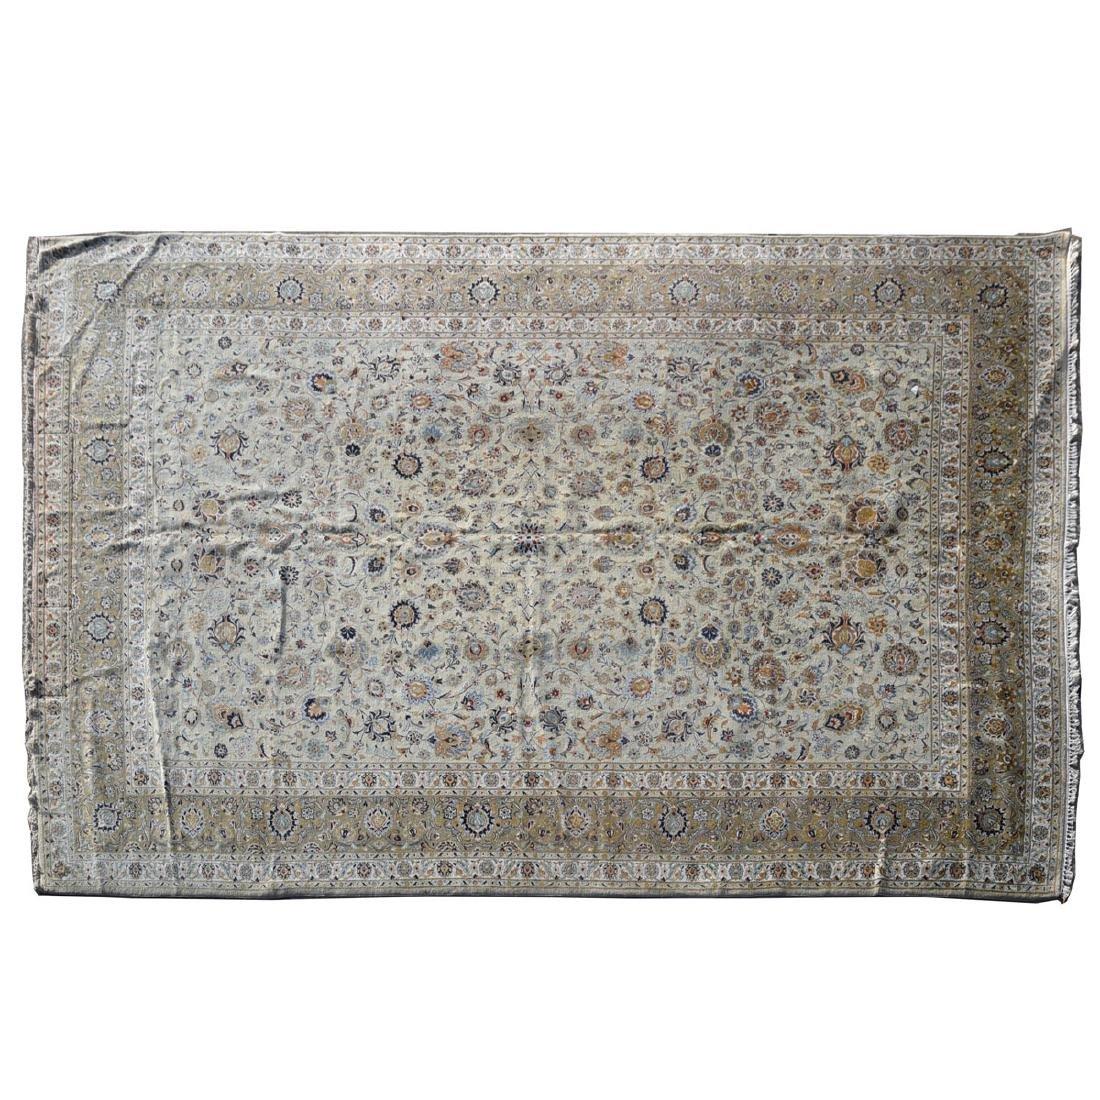 Large Indo-Kashan Ivory Field Wool Carpet